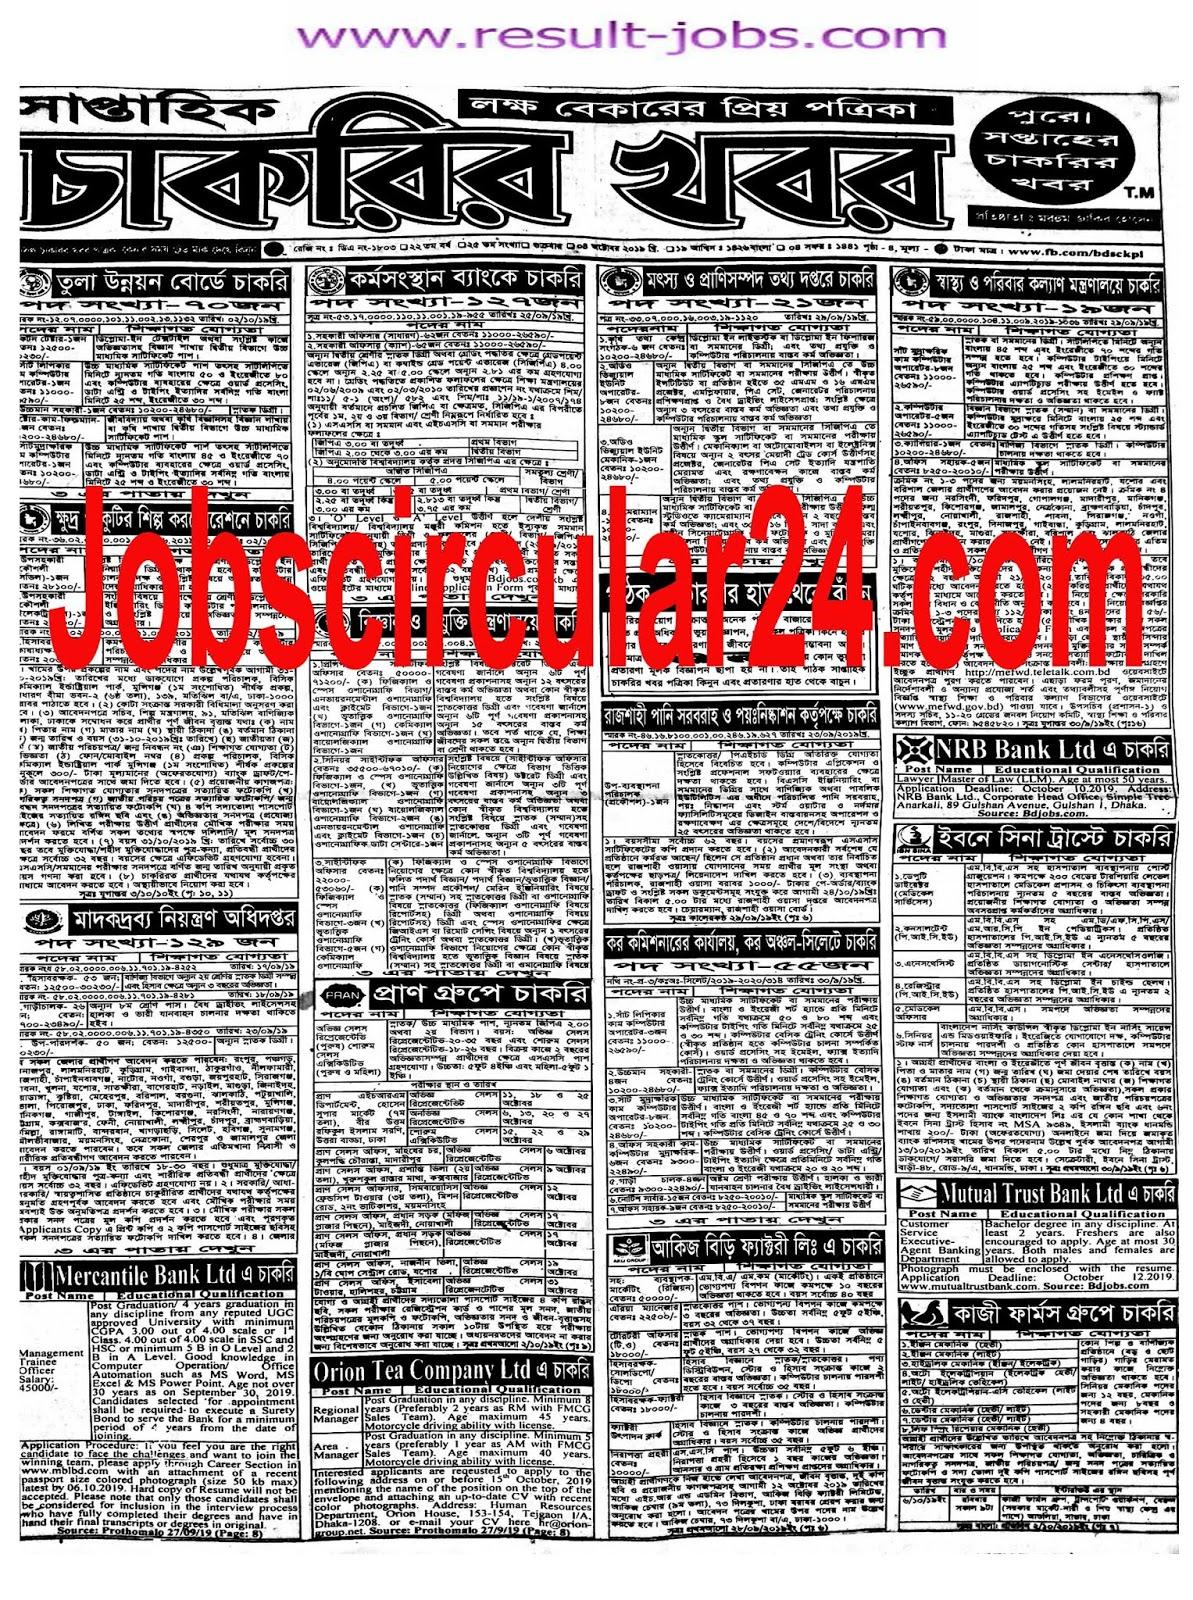 ajker chakrir khobor, ajker chakrir potrika, all job news, all jobs bd newspaper, bangladesh job news, bank job news, bd govt chakrir khobor, bd govt job circular, bd govt jobs, bd job circular, new job today 2019, bd job news bangla, bd job news com,weekly chakrir khobor bangla newspaper publish, b